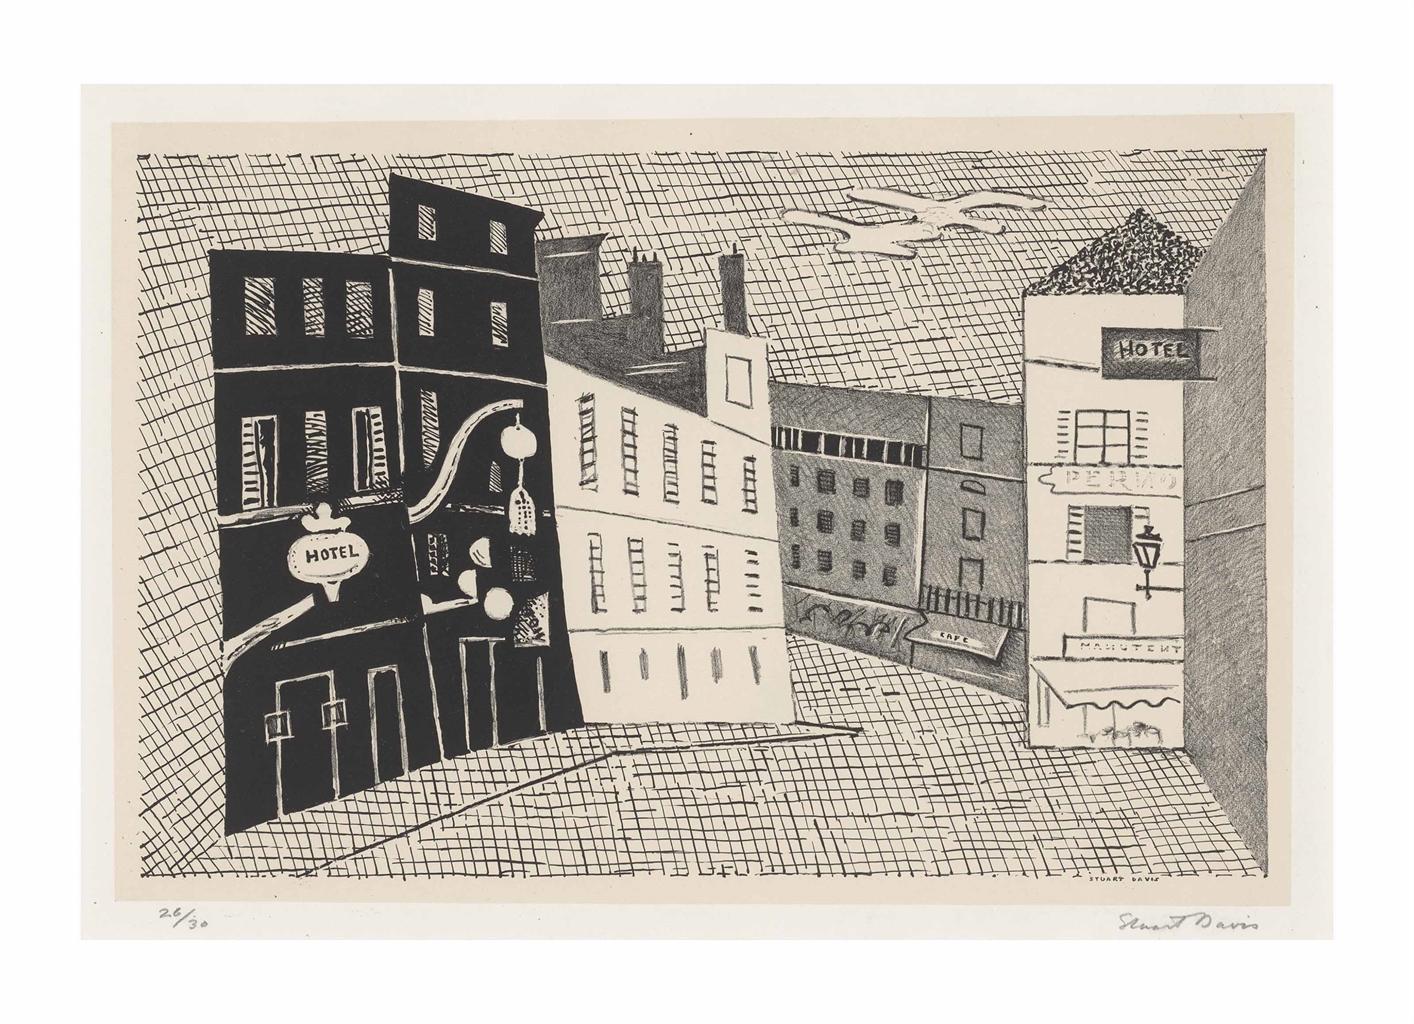 Stuart Davis-Rue de l'Echaude-1929